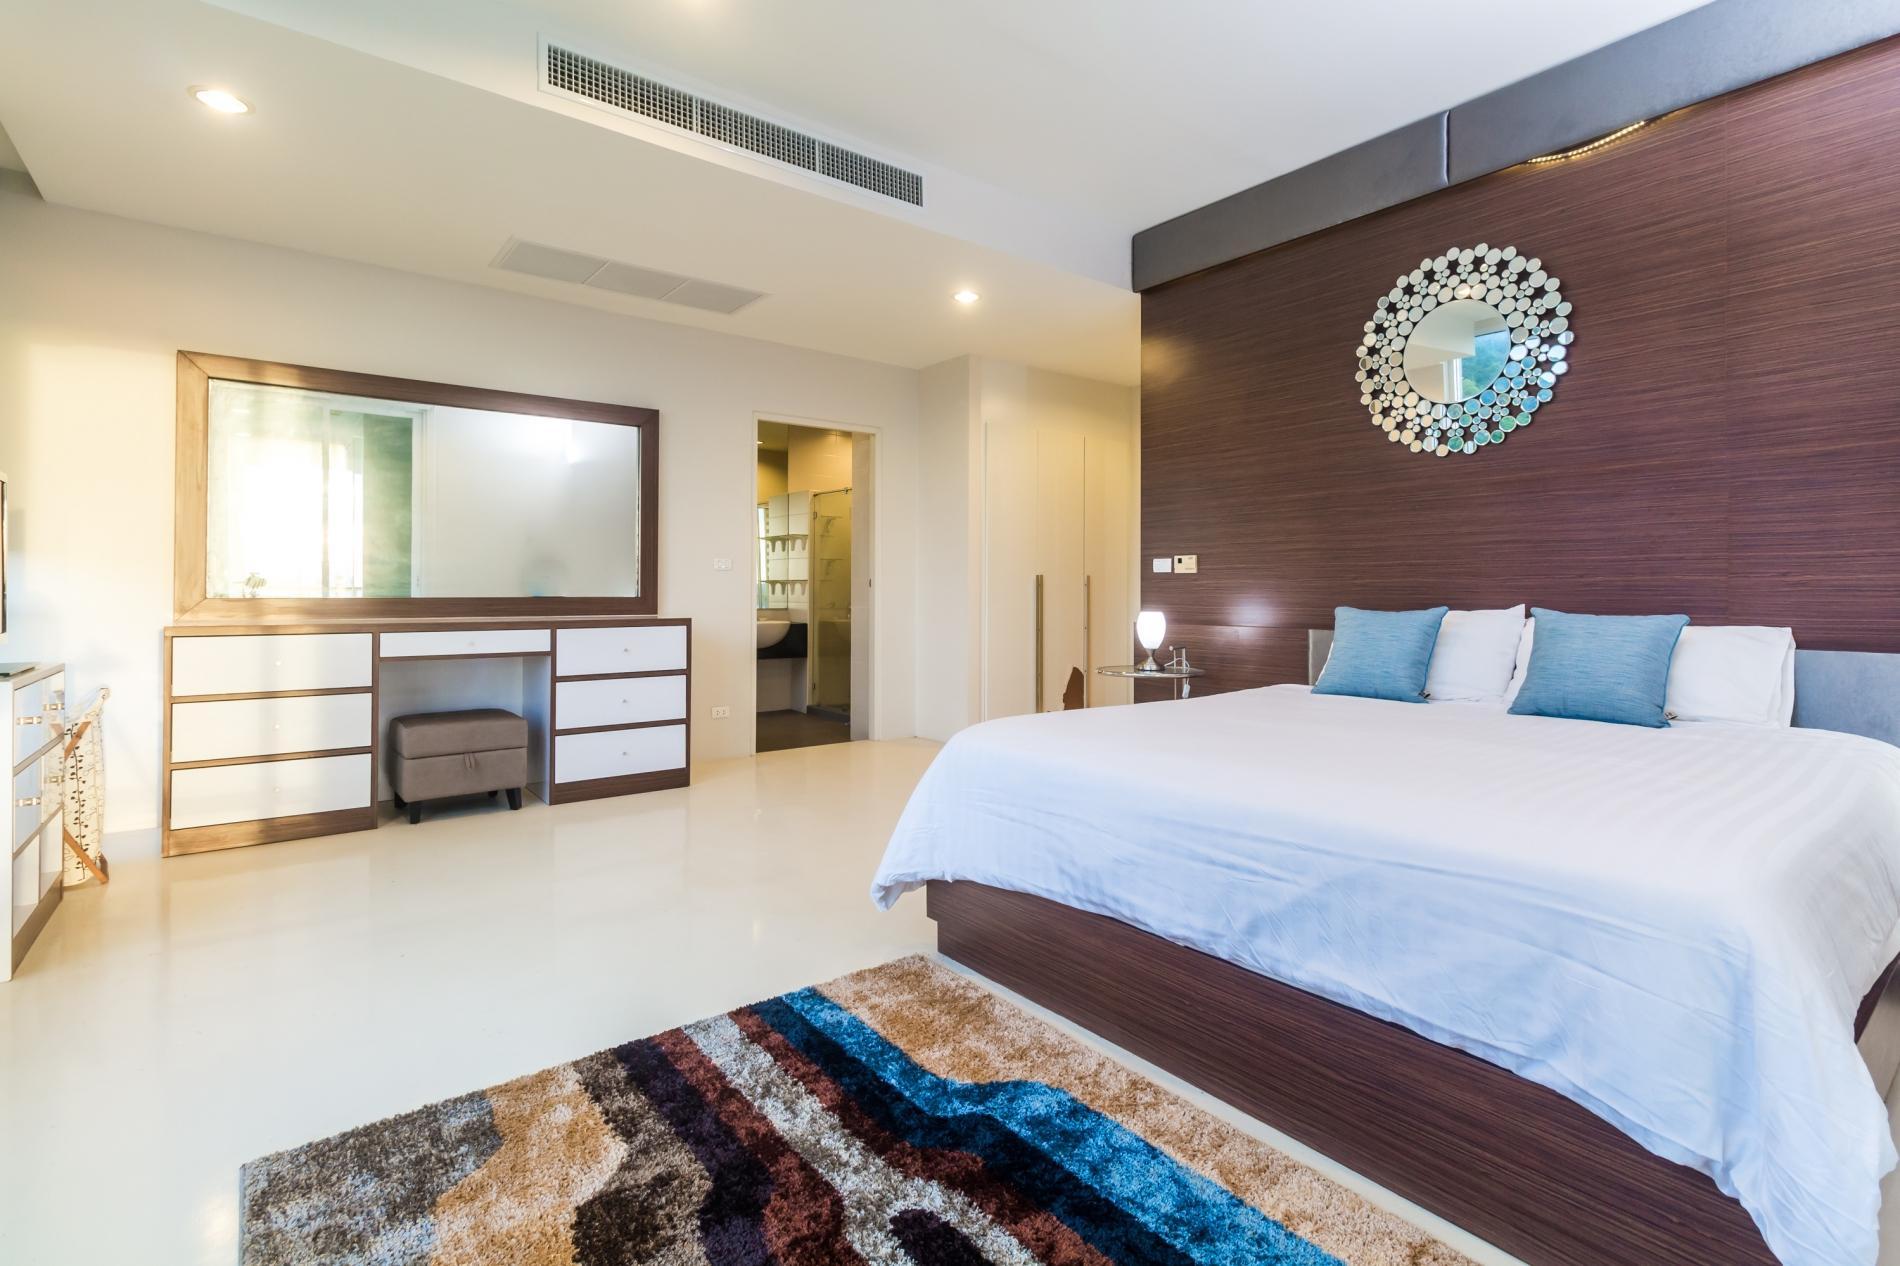 Apartment KH2605 - Sea-view Penthouse in Karon  walk to beach  restaurants  bars  shops photo 20320993